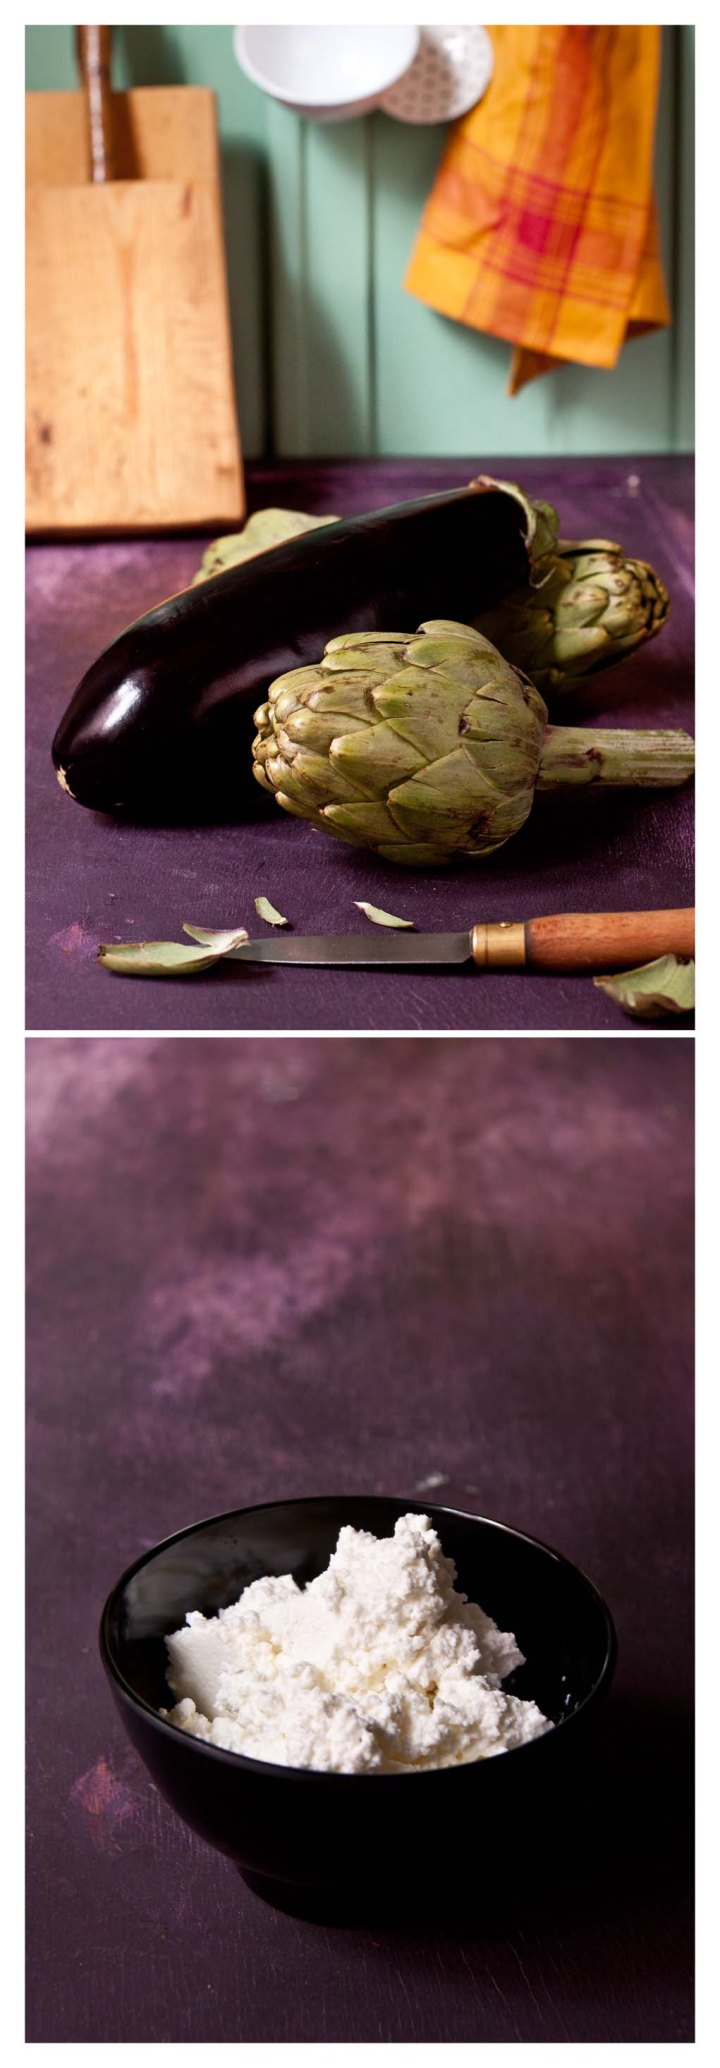 Berenjena-alcachofas-y-requeson